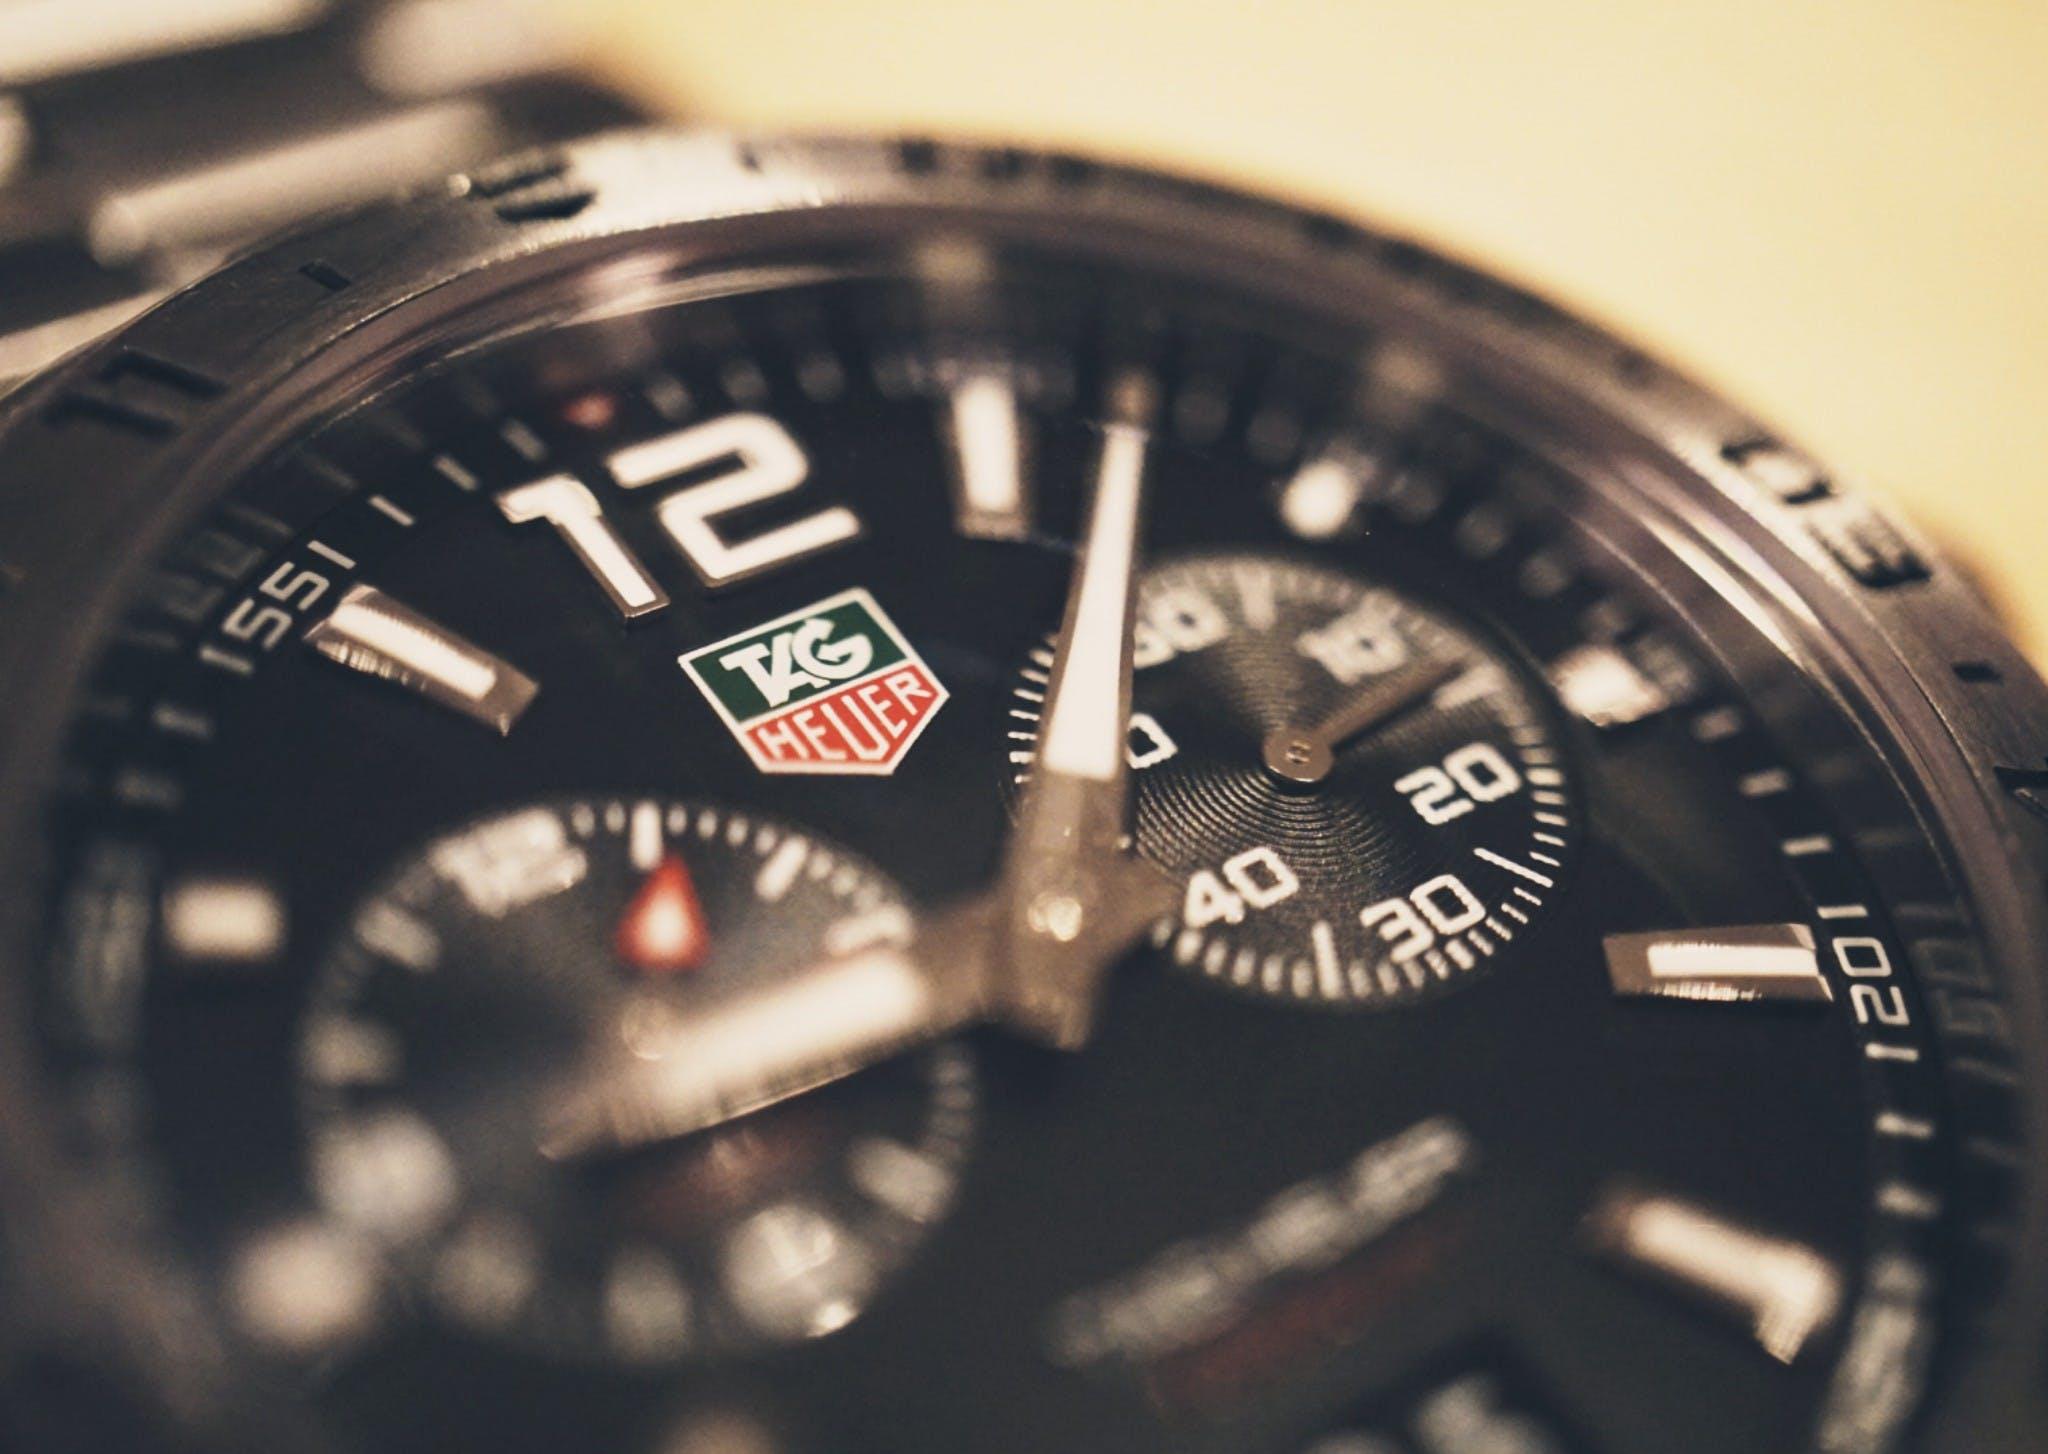 Round Black Tag Heuer Chronograph Watch